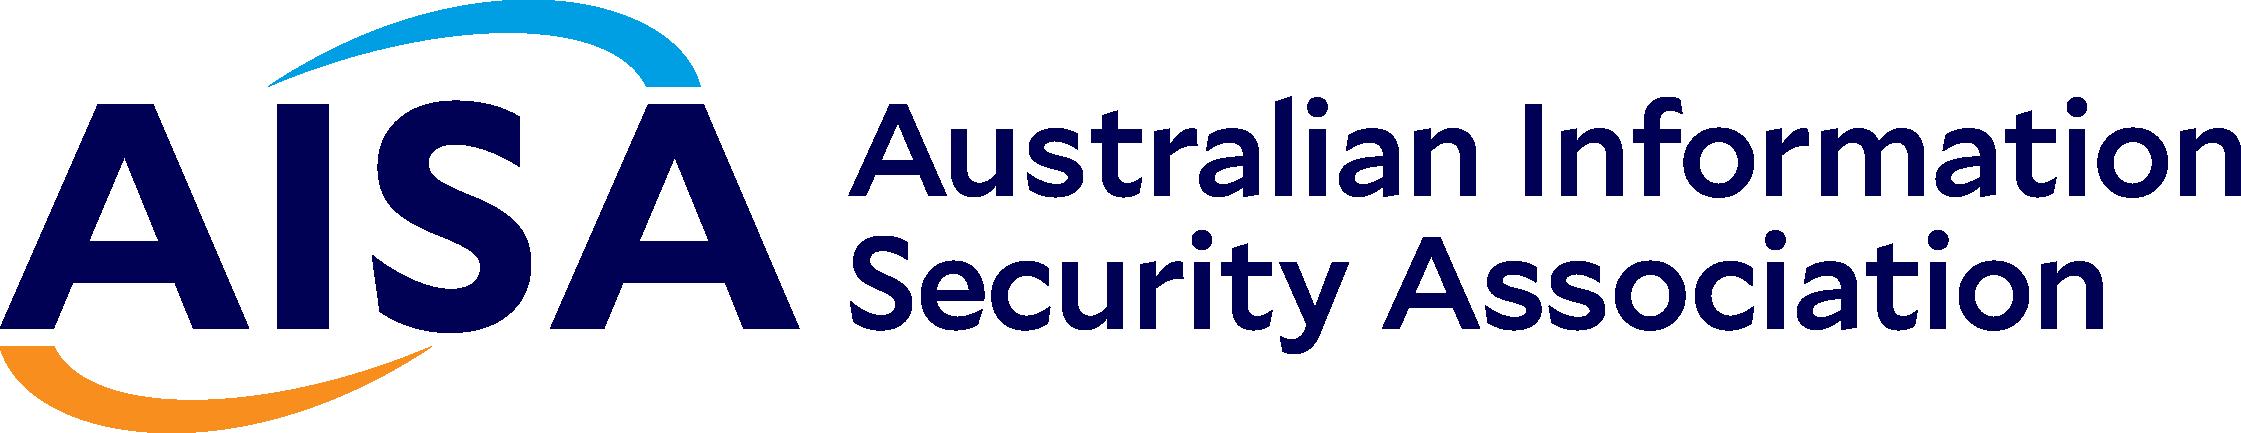 AISA 澳大利亚信息安全协会徽标